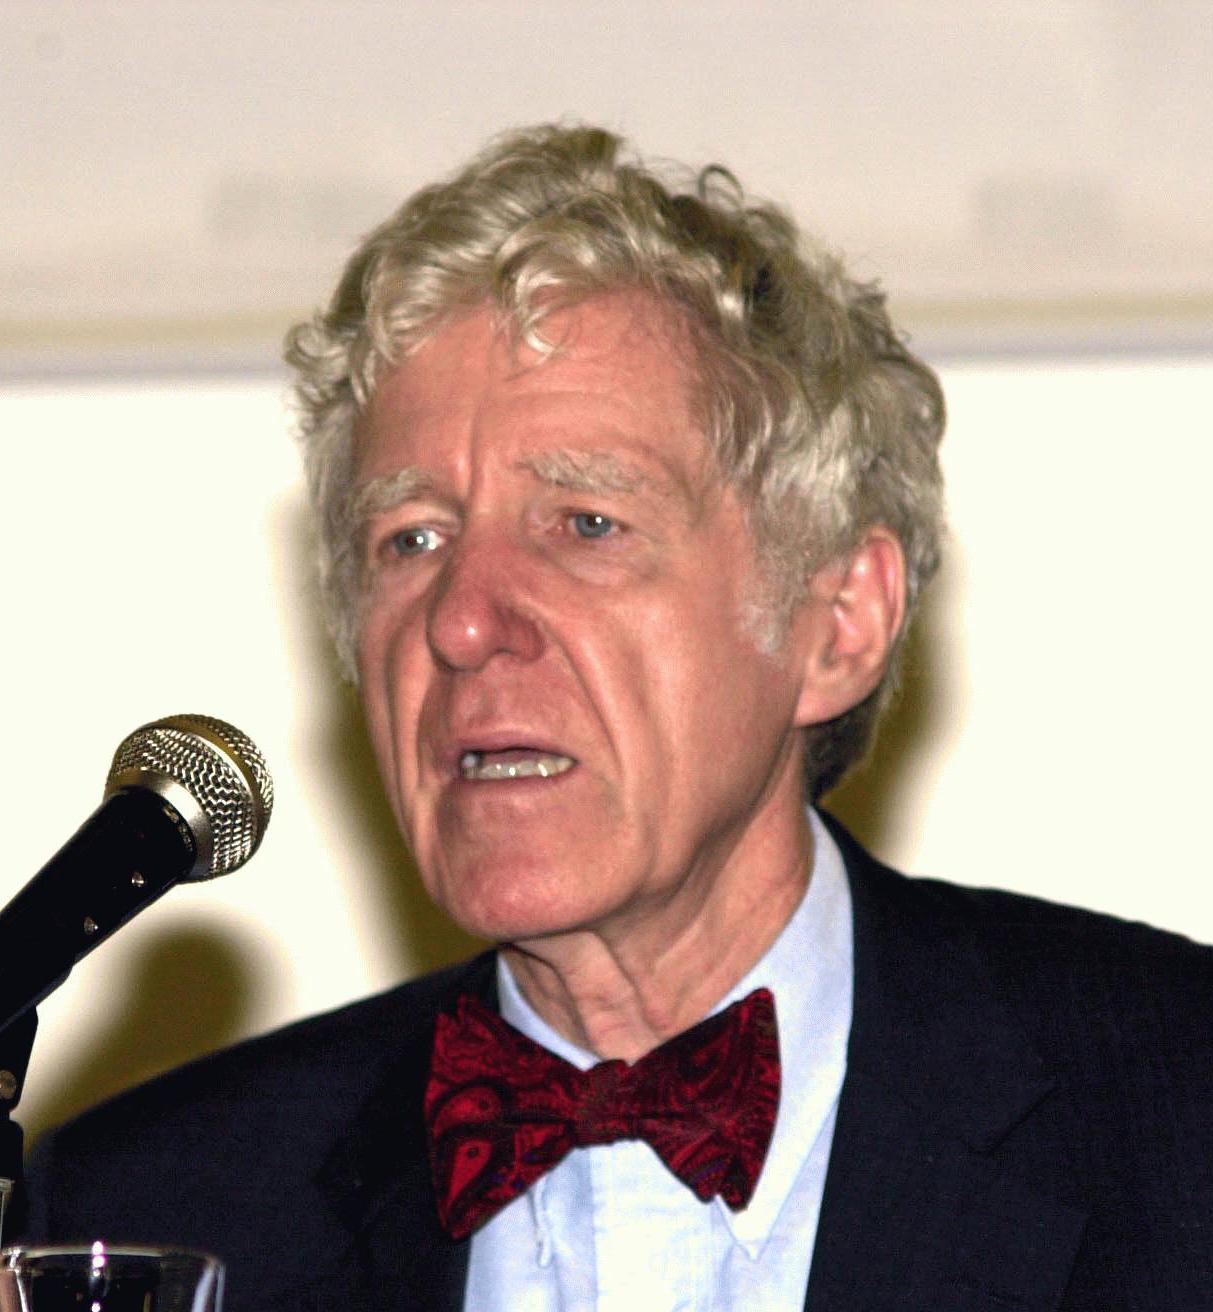 Lester Brown in 2003.